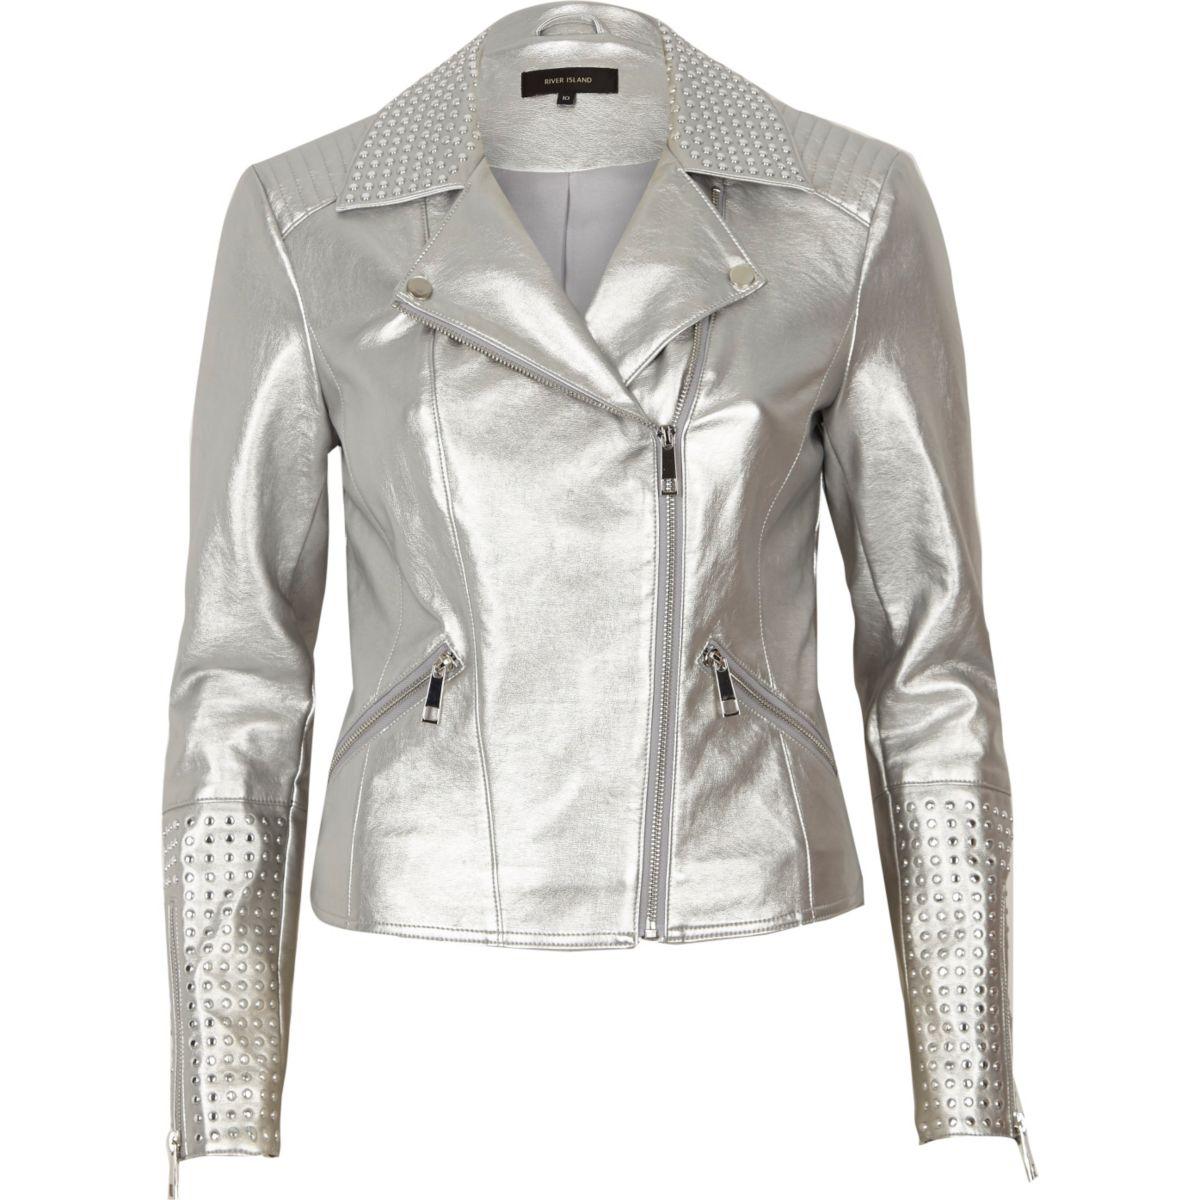 Silver faux leather studded biker jacket